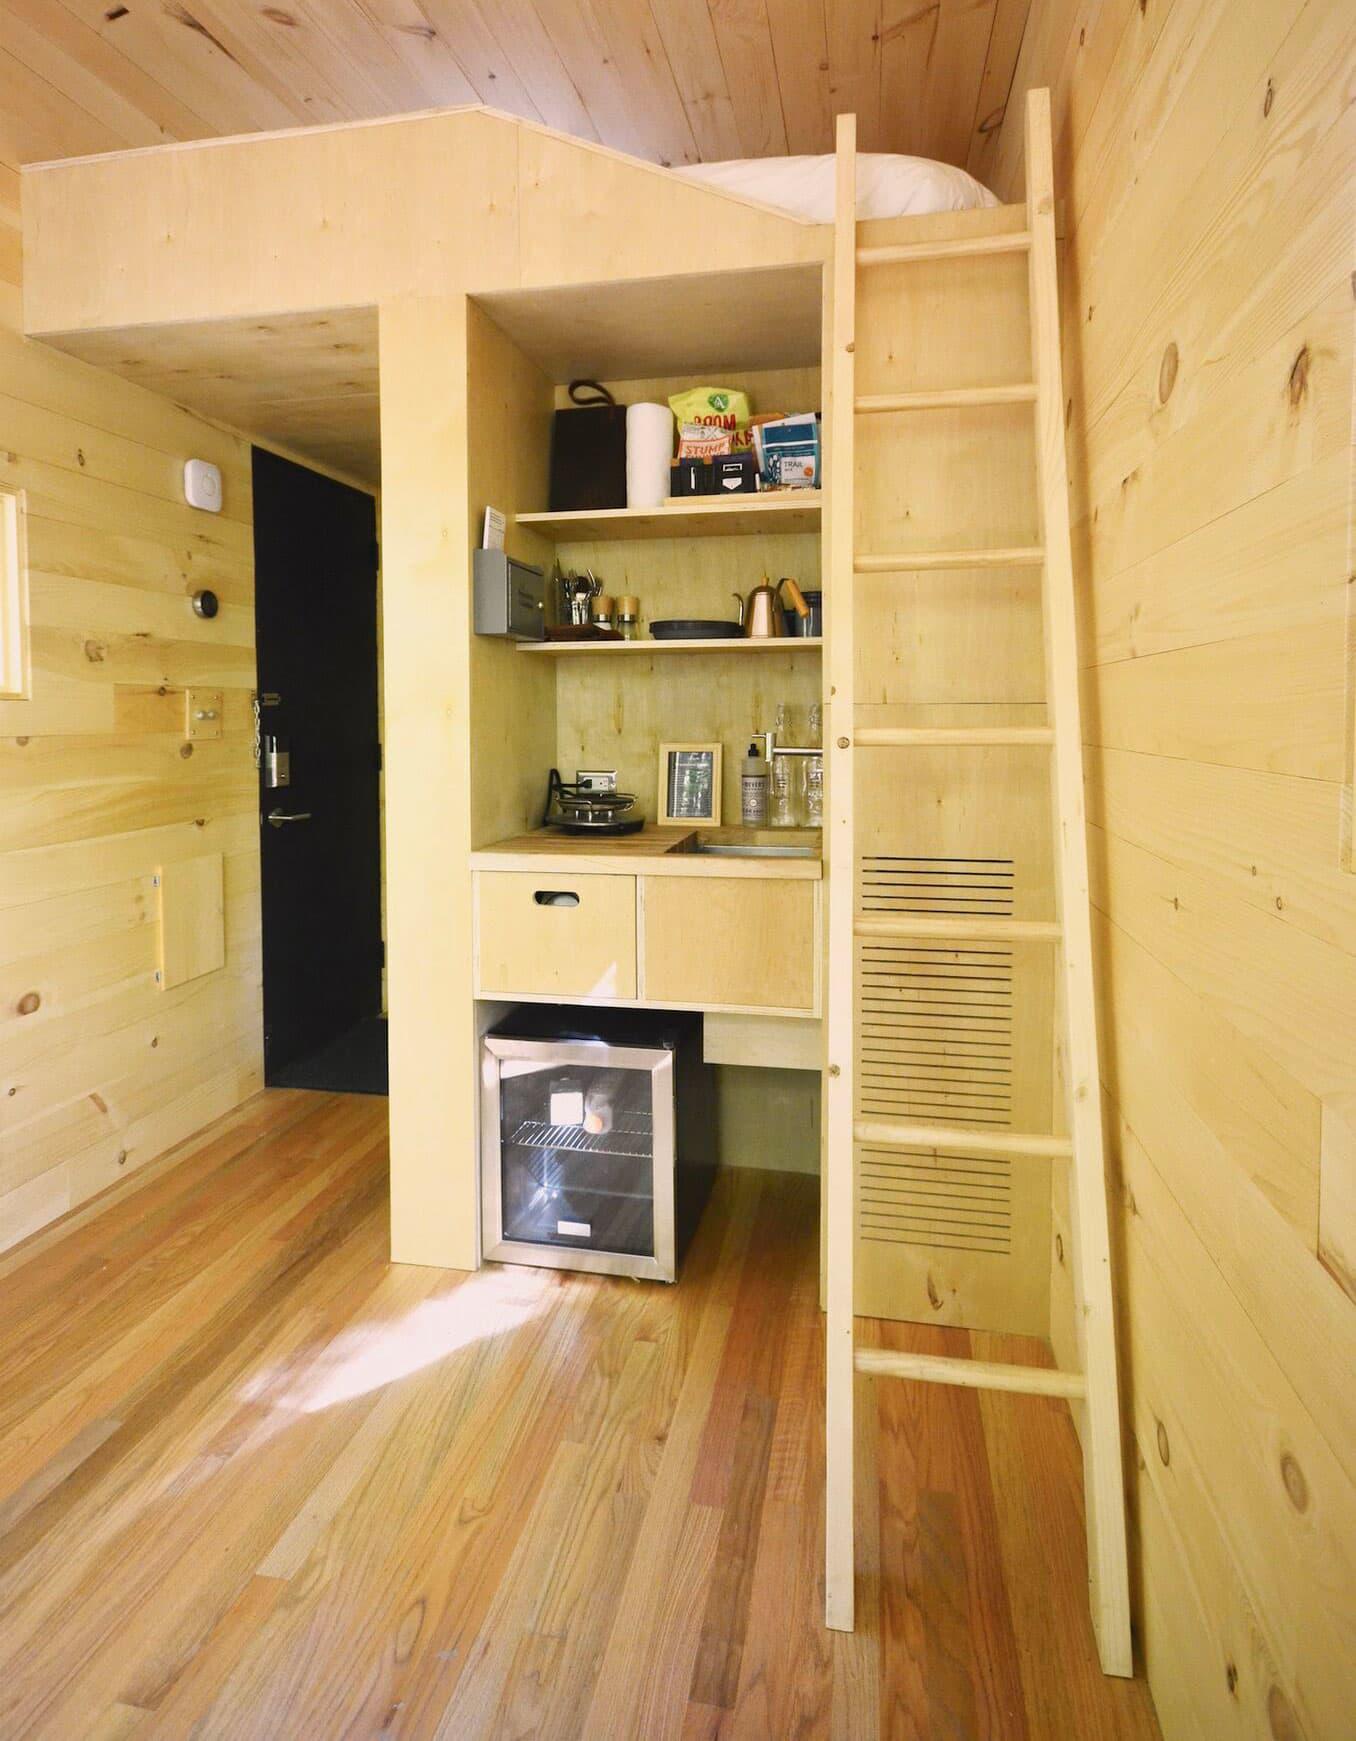 Handout: Getaway Mini interior with steps